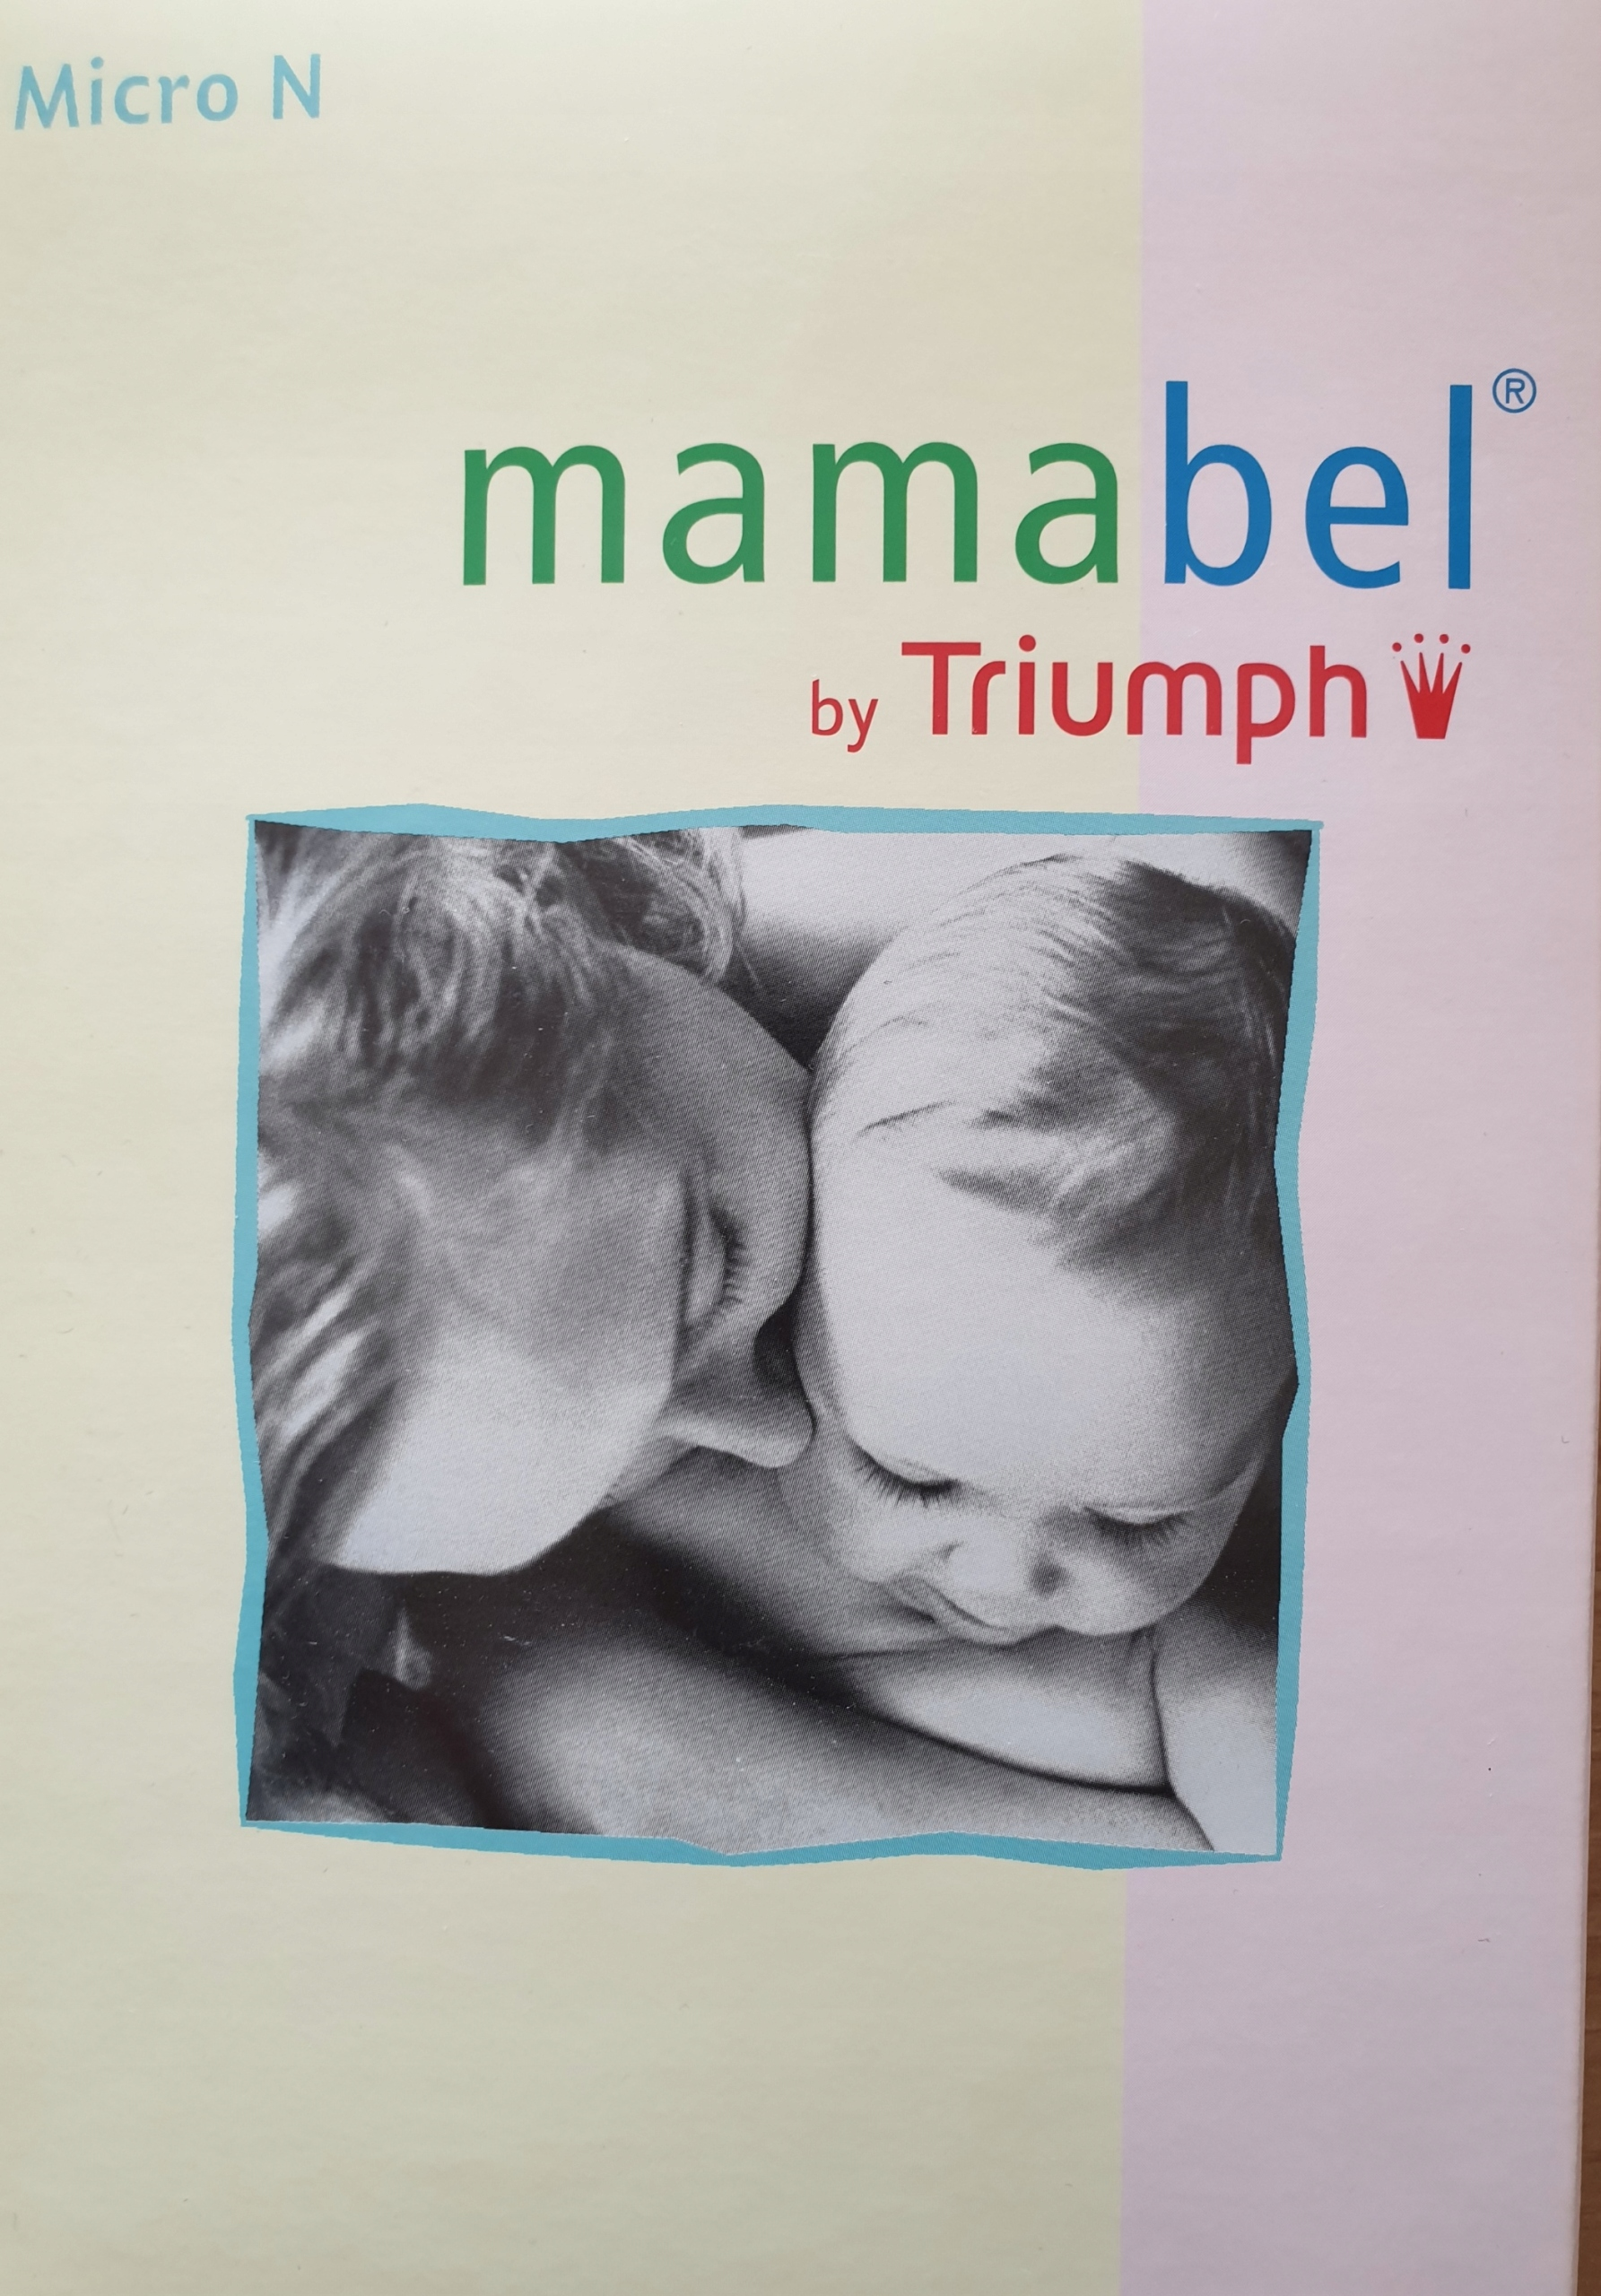 BIUSTONOSZ TRIUMPH MAMABEL MICRO N 80D BIAŁY -70%